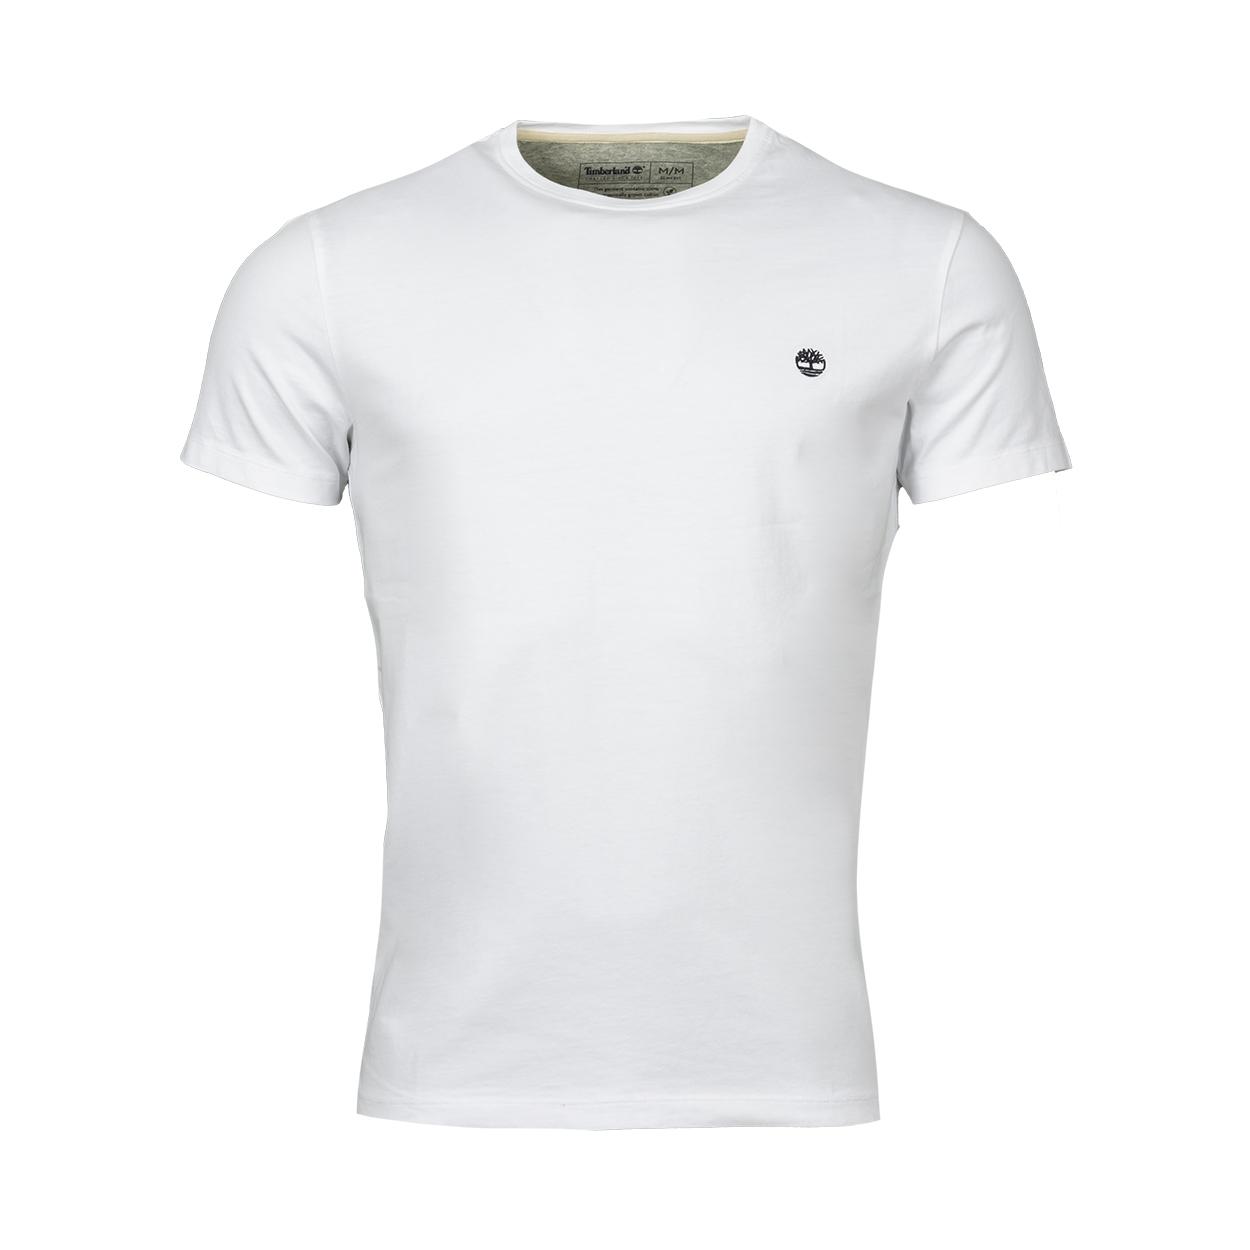 Tee-shirt col rond  en coton blanc brodé